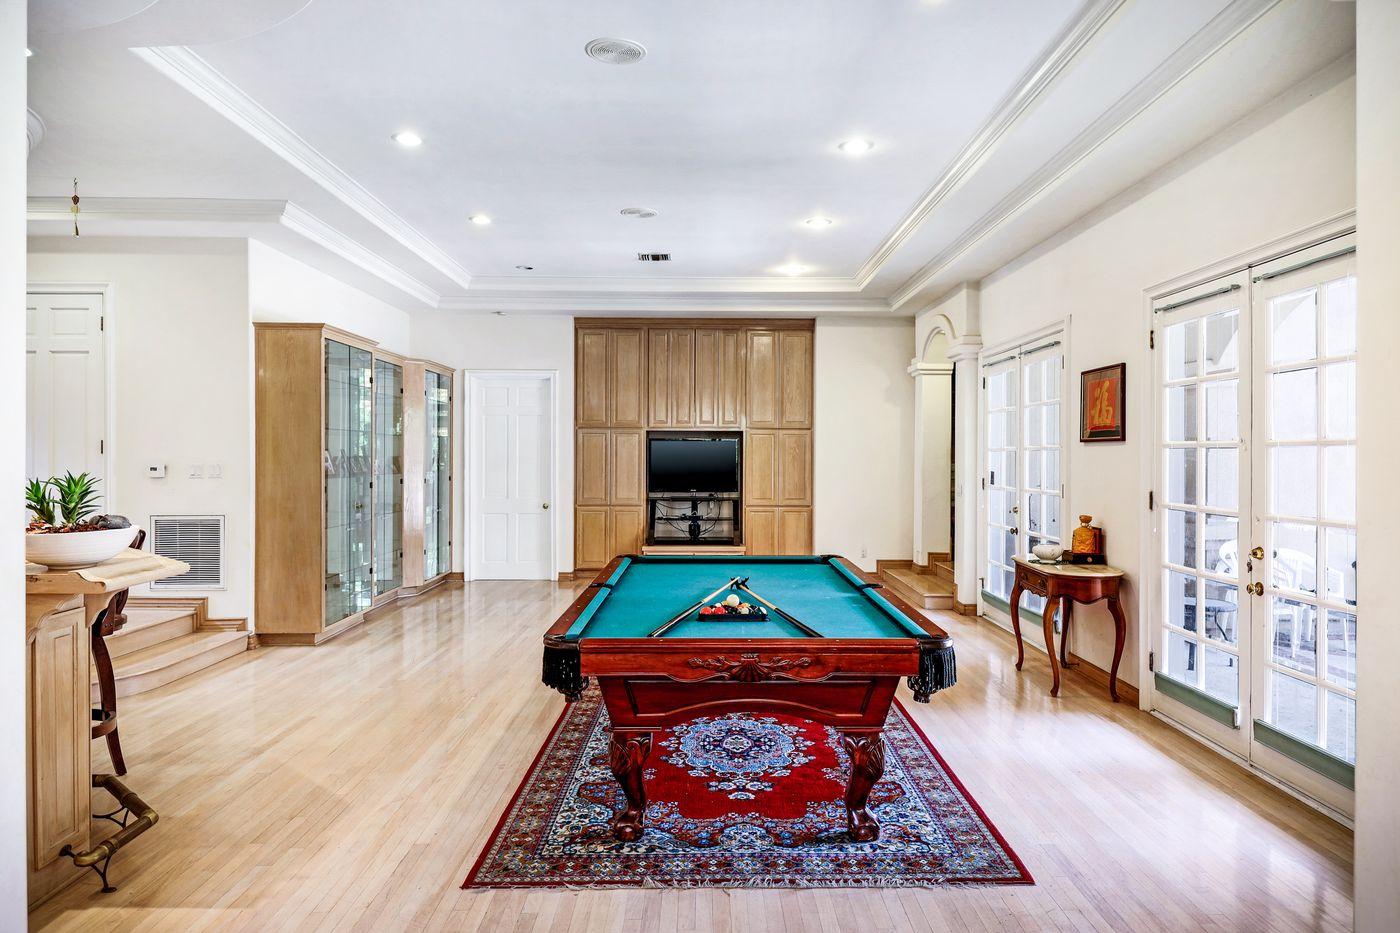 real-estate-photography-2245 Kingsbridge Ct-San Dimas-91773-airbnb-rental-interior-design-photographer-kasi-hyrapett-18